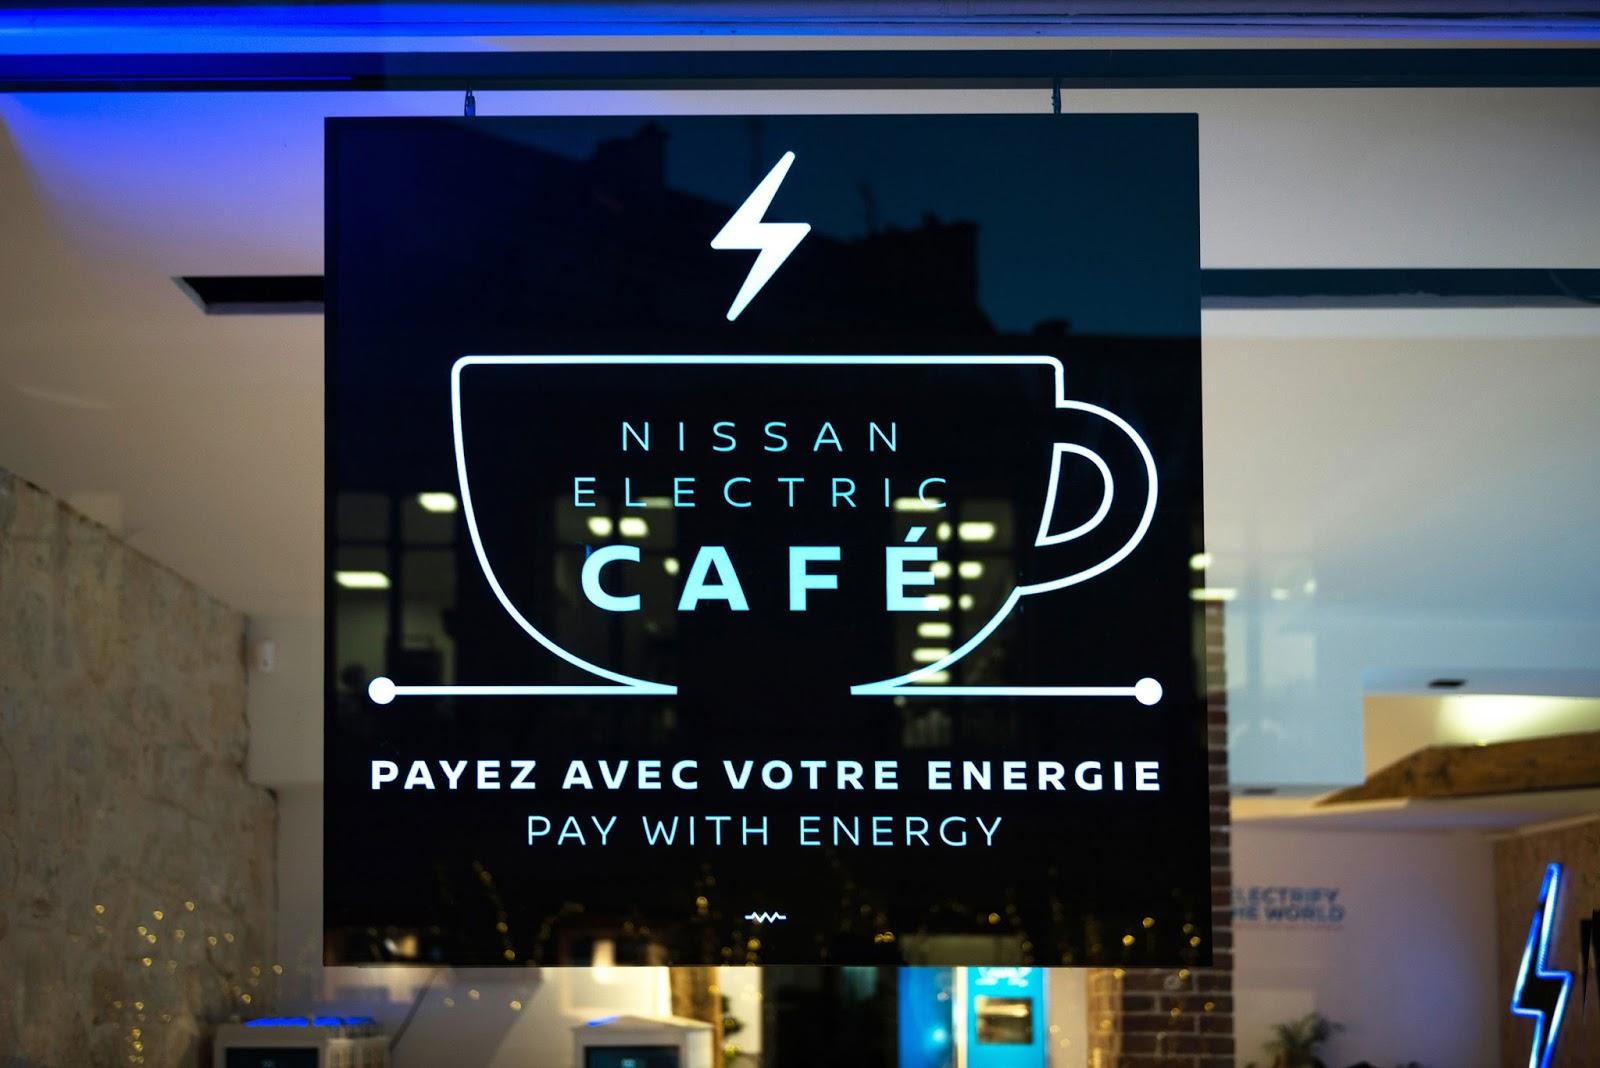 Nissan Cafe1 Πλήρωσε τον καφέ σου με ηλεκτρική ενέργεια!